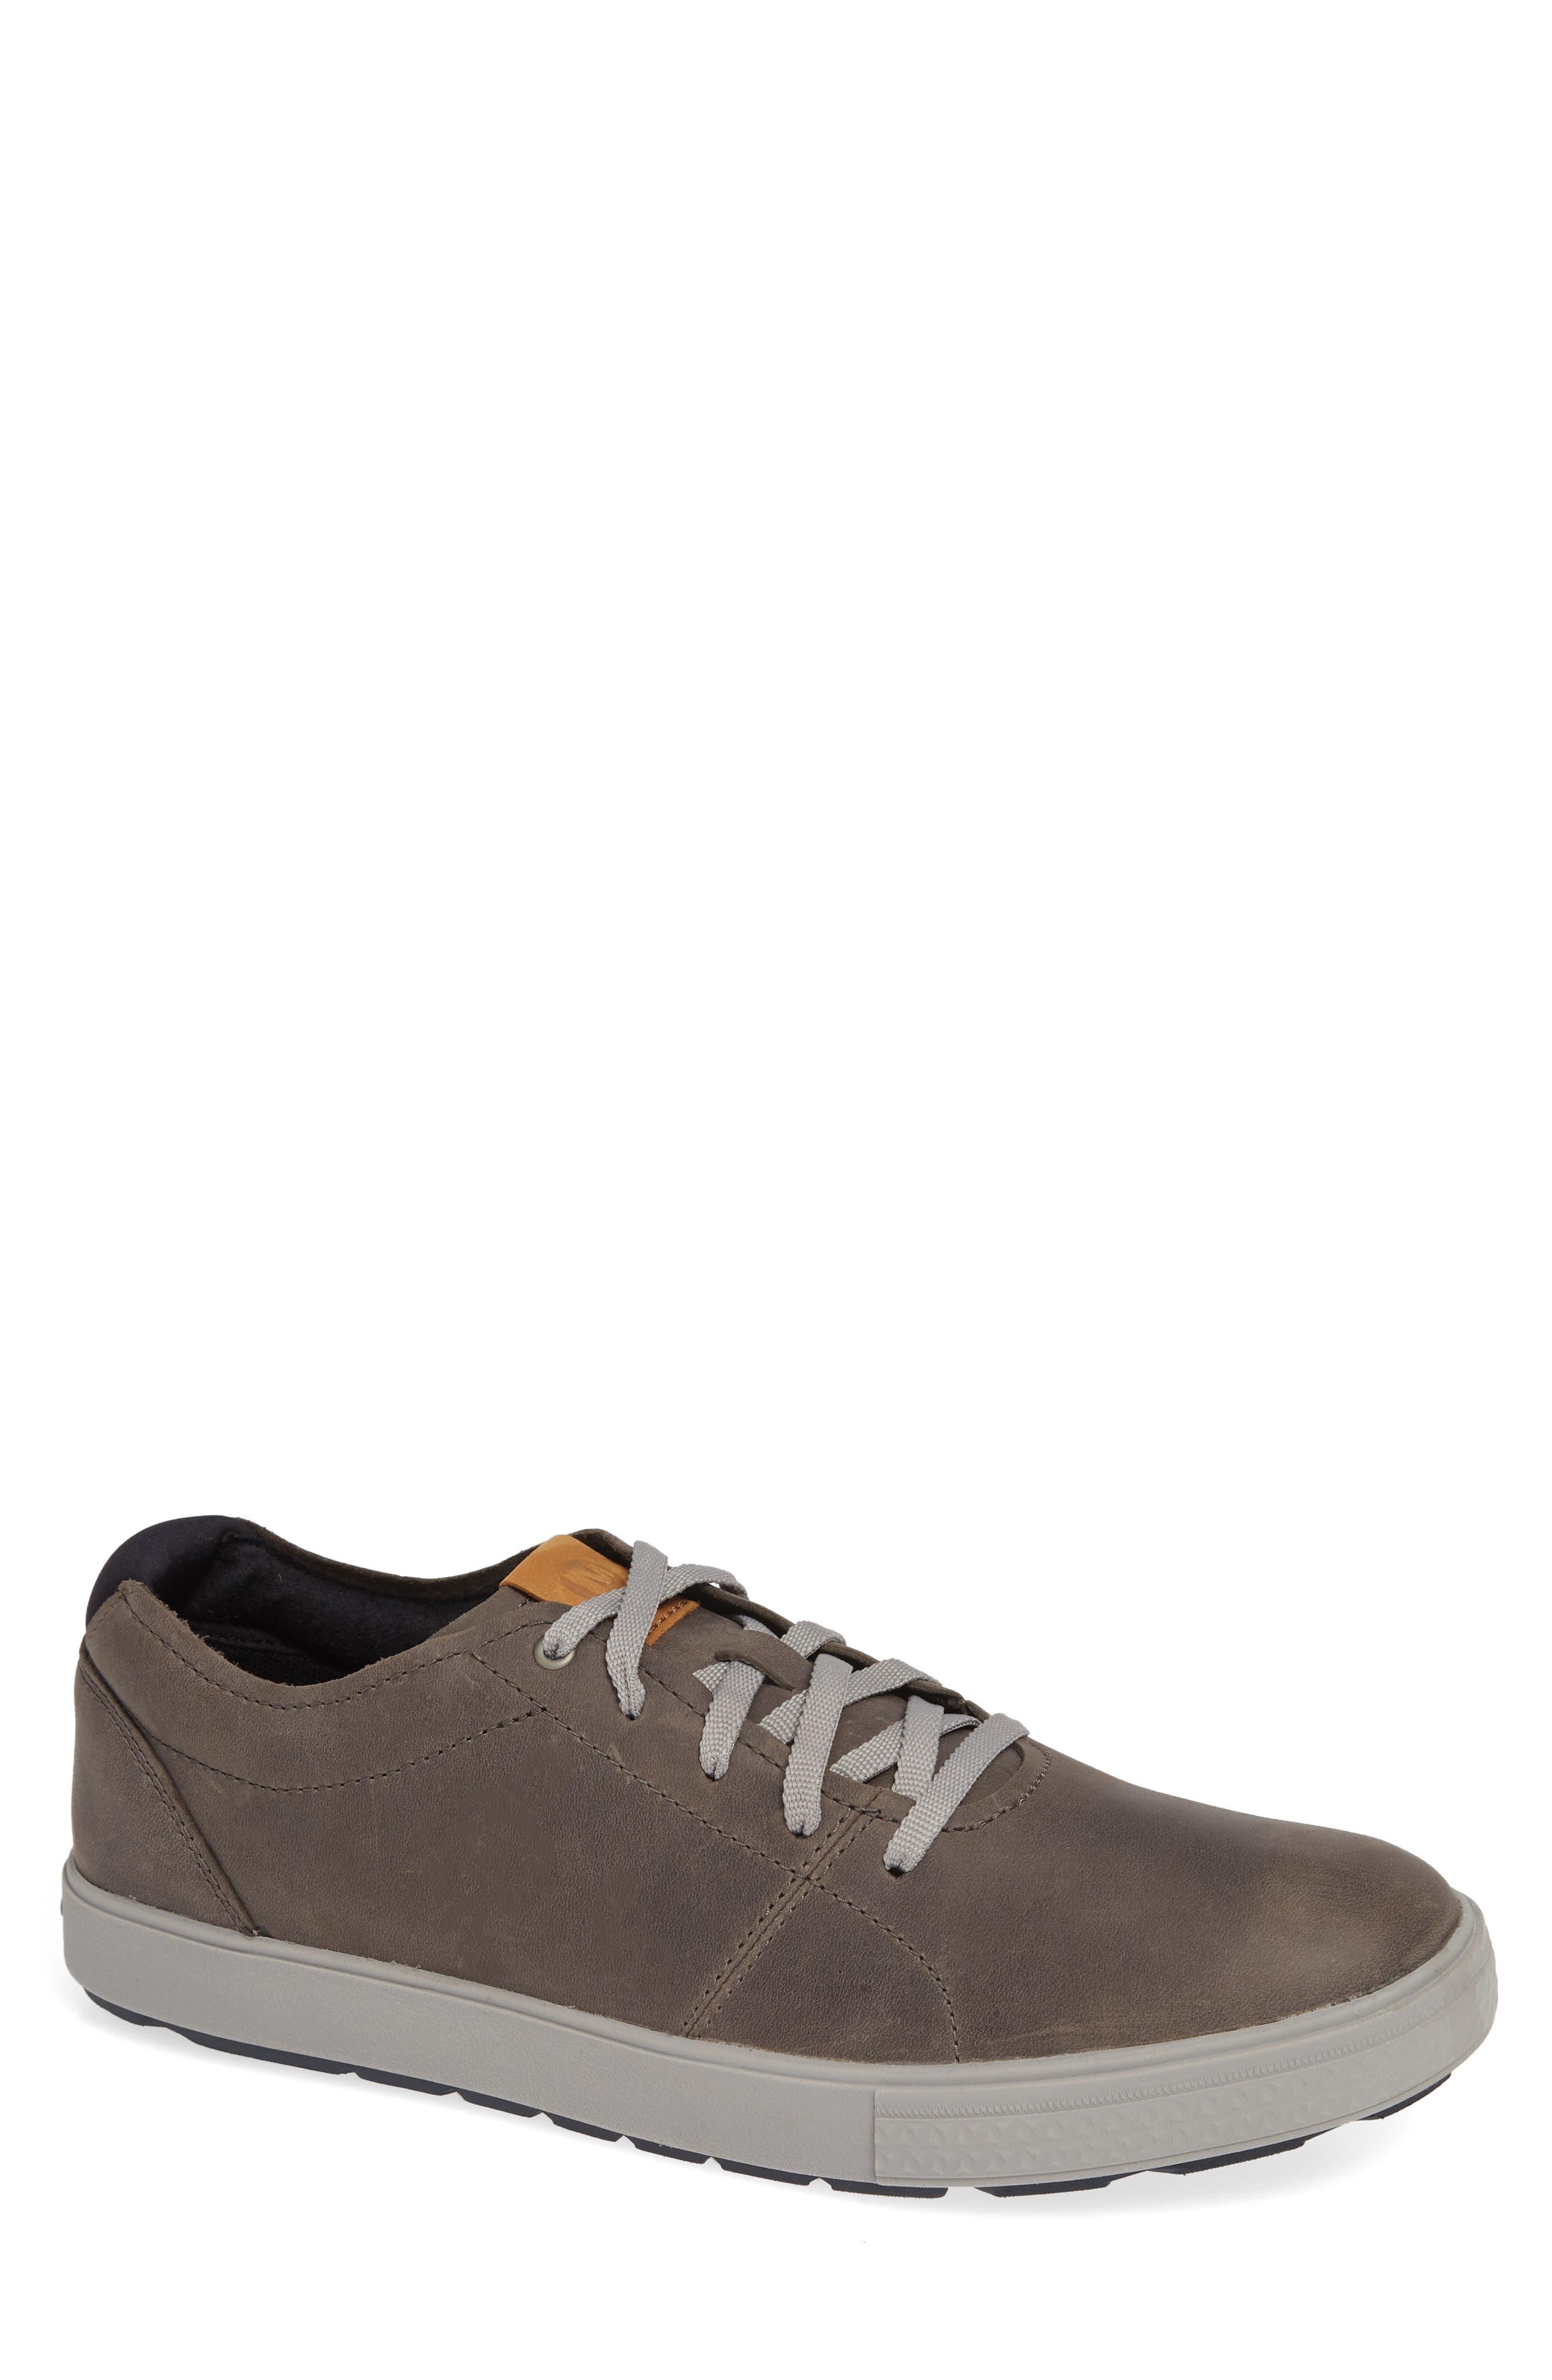 MERRELL Barkley Sneaker, Main, color, CASTLE ROCK